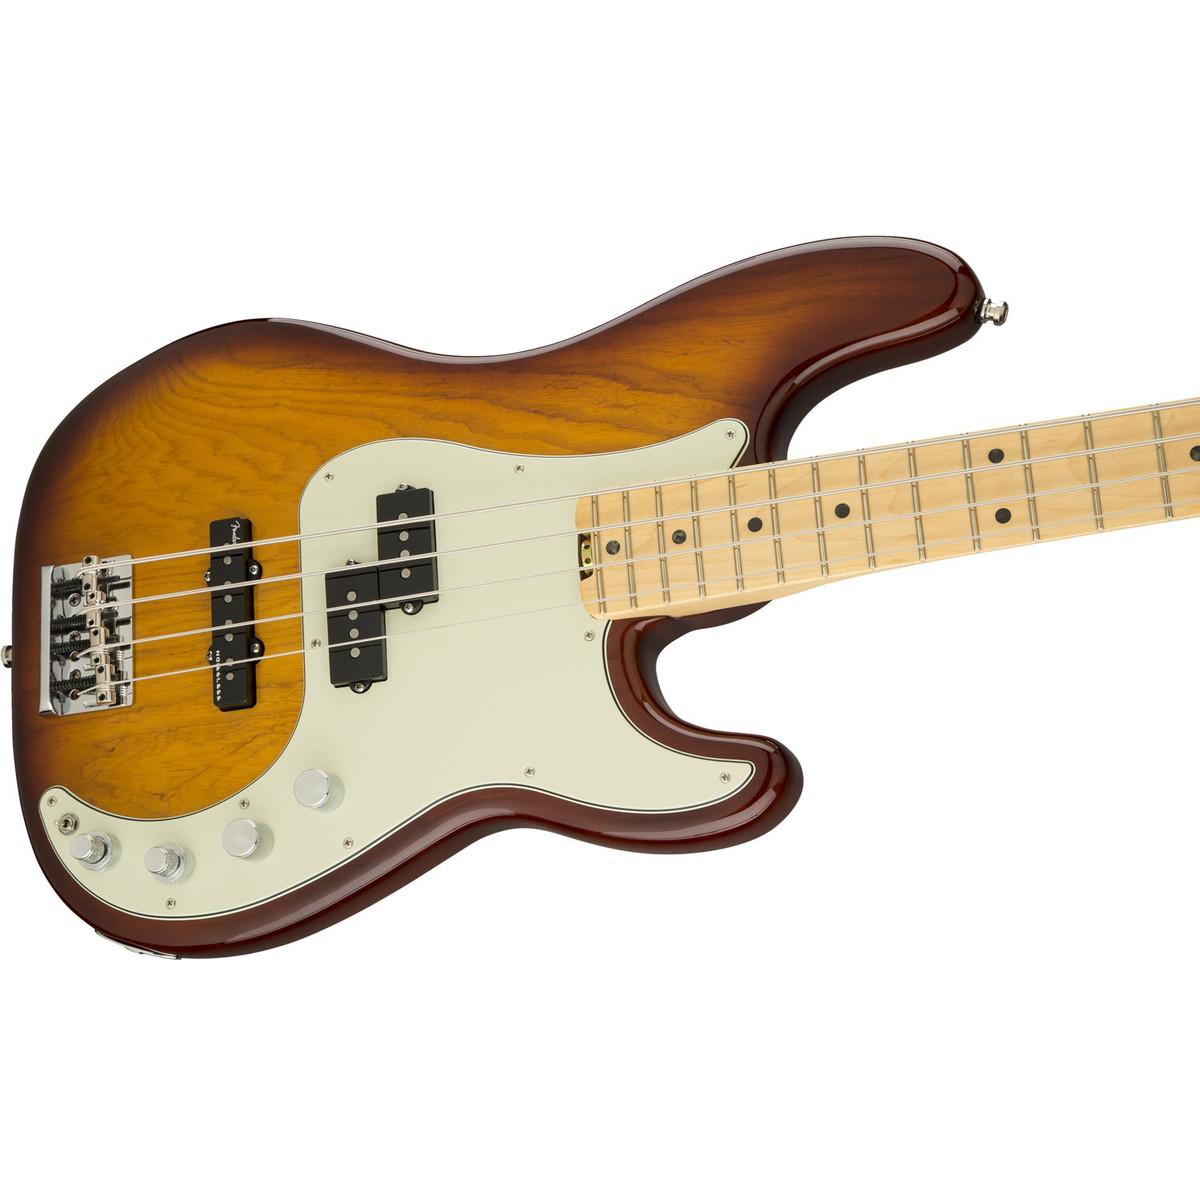 fender american elite p bass guitar tobacco sunburst at gear4music. Black Bedroom Furniture Sets. Home Design Ideas